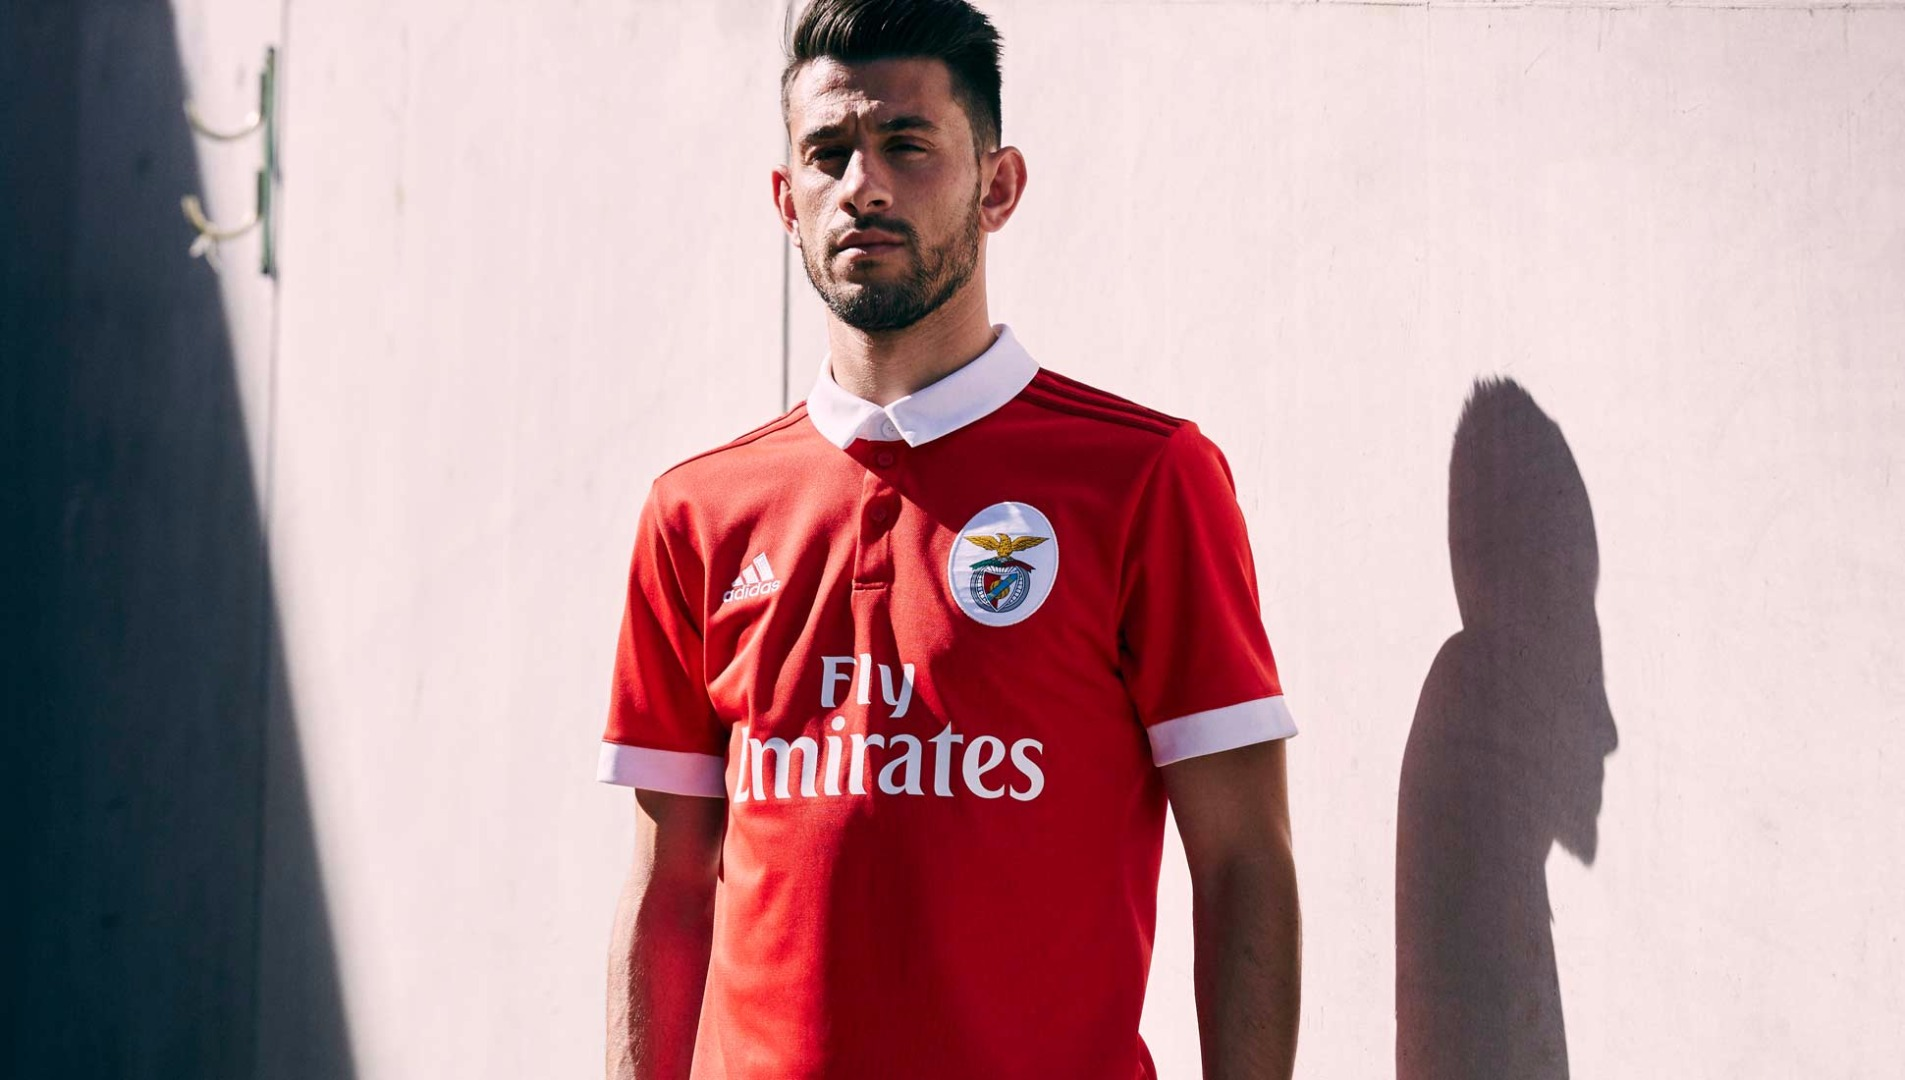 e9beb6f89d0 Benfica 2017 18 adidas Home Shirt - SoccerBible.